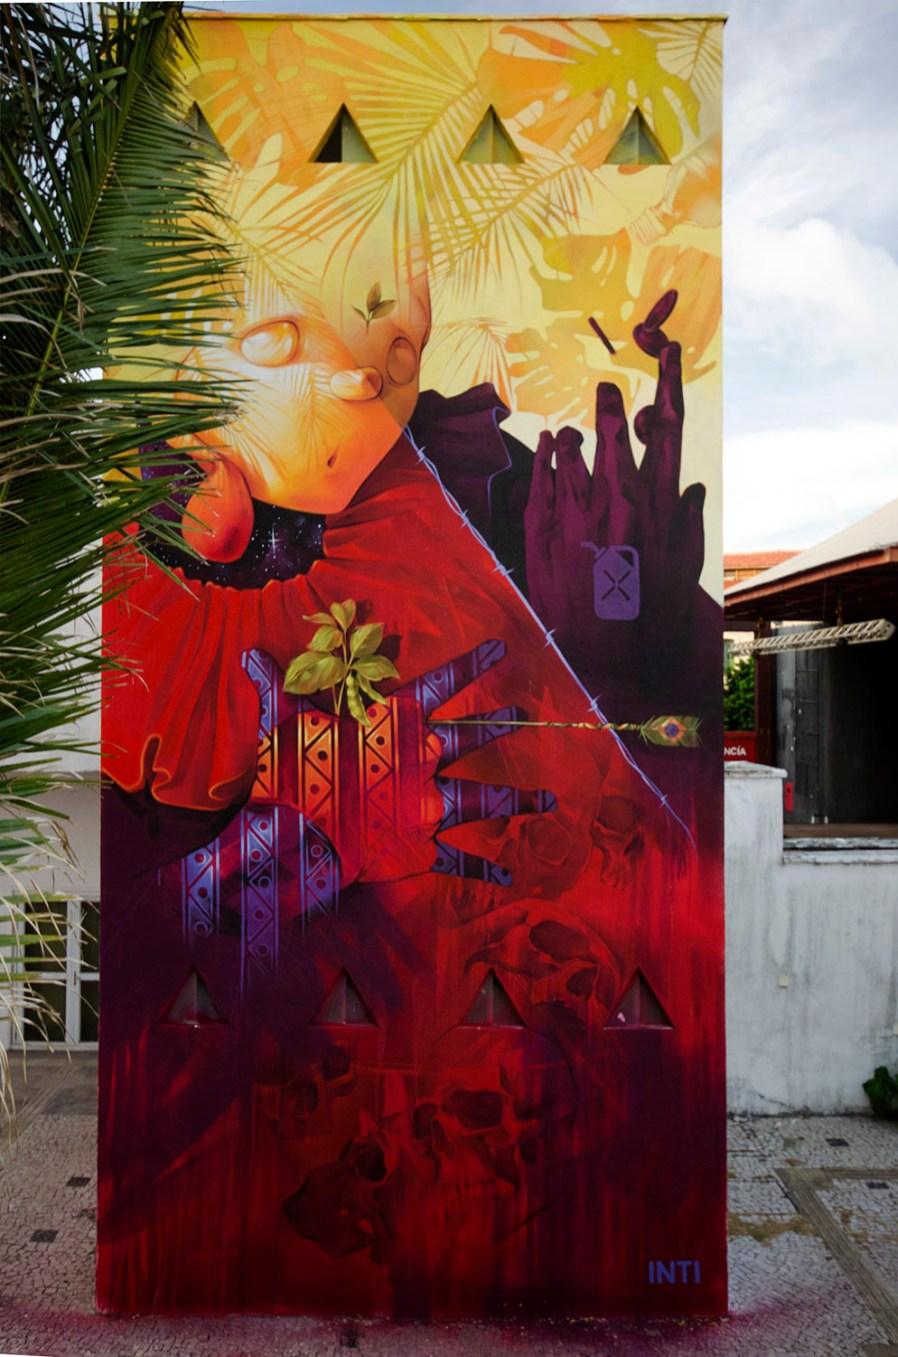 "INTI, Street Art ""Natural resources 2"" Mural, Brazil 2019. Photo Credit INTI"